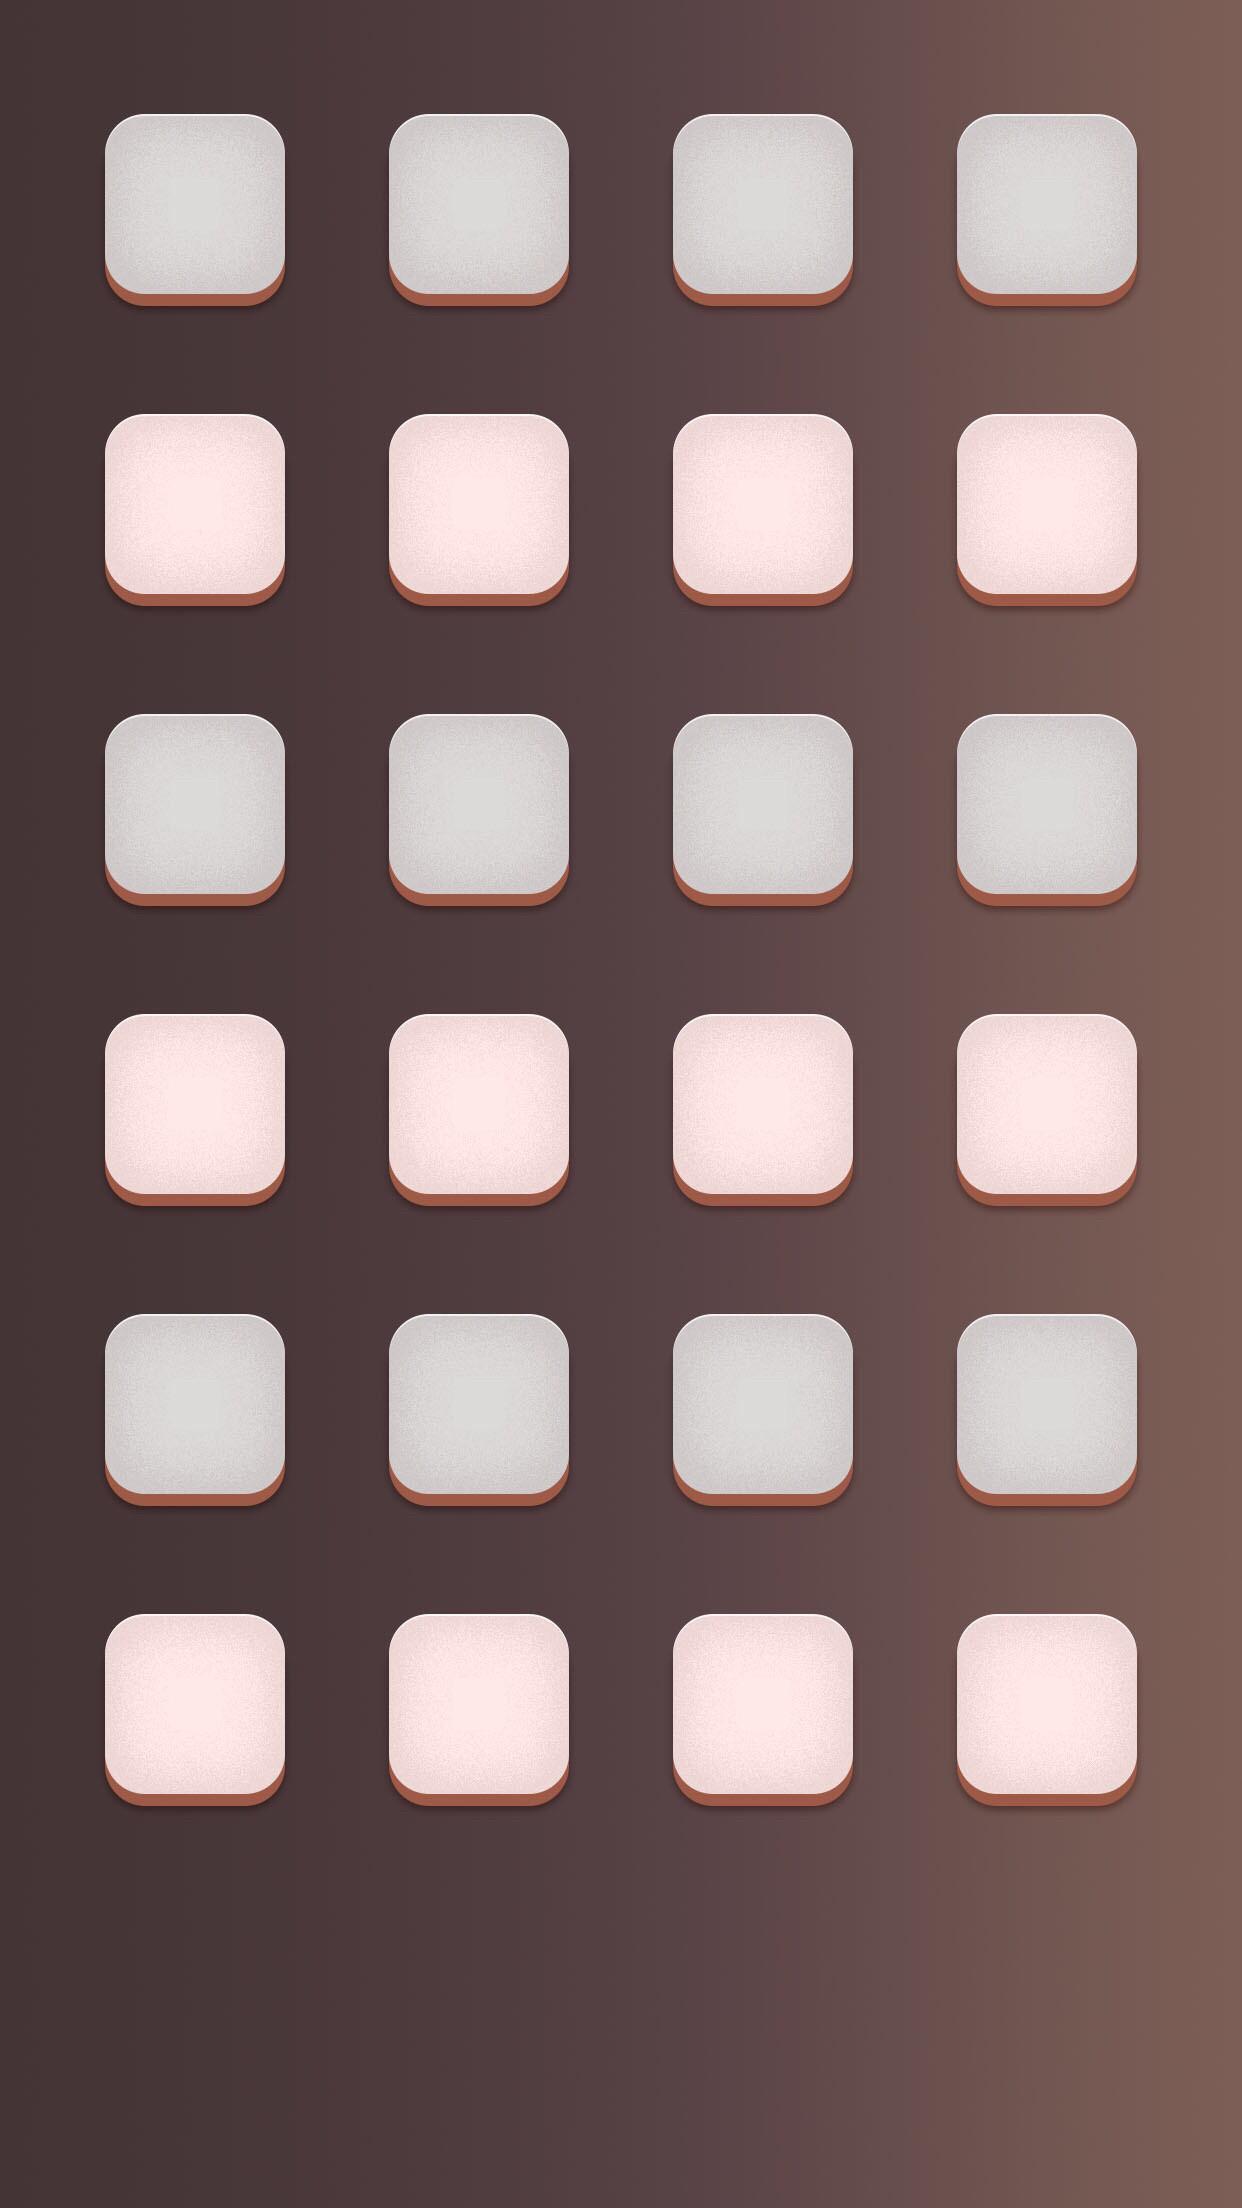 IPhone 6 Shelf Wallpaper 91 images 1242x2208